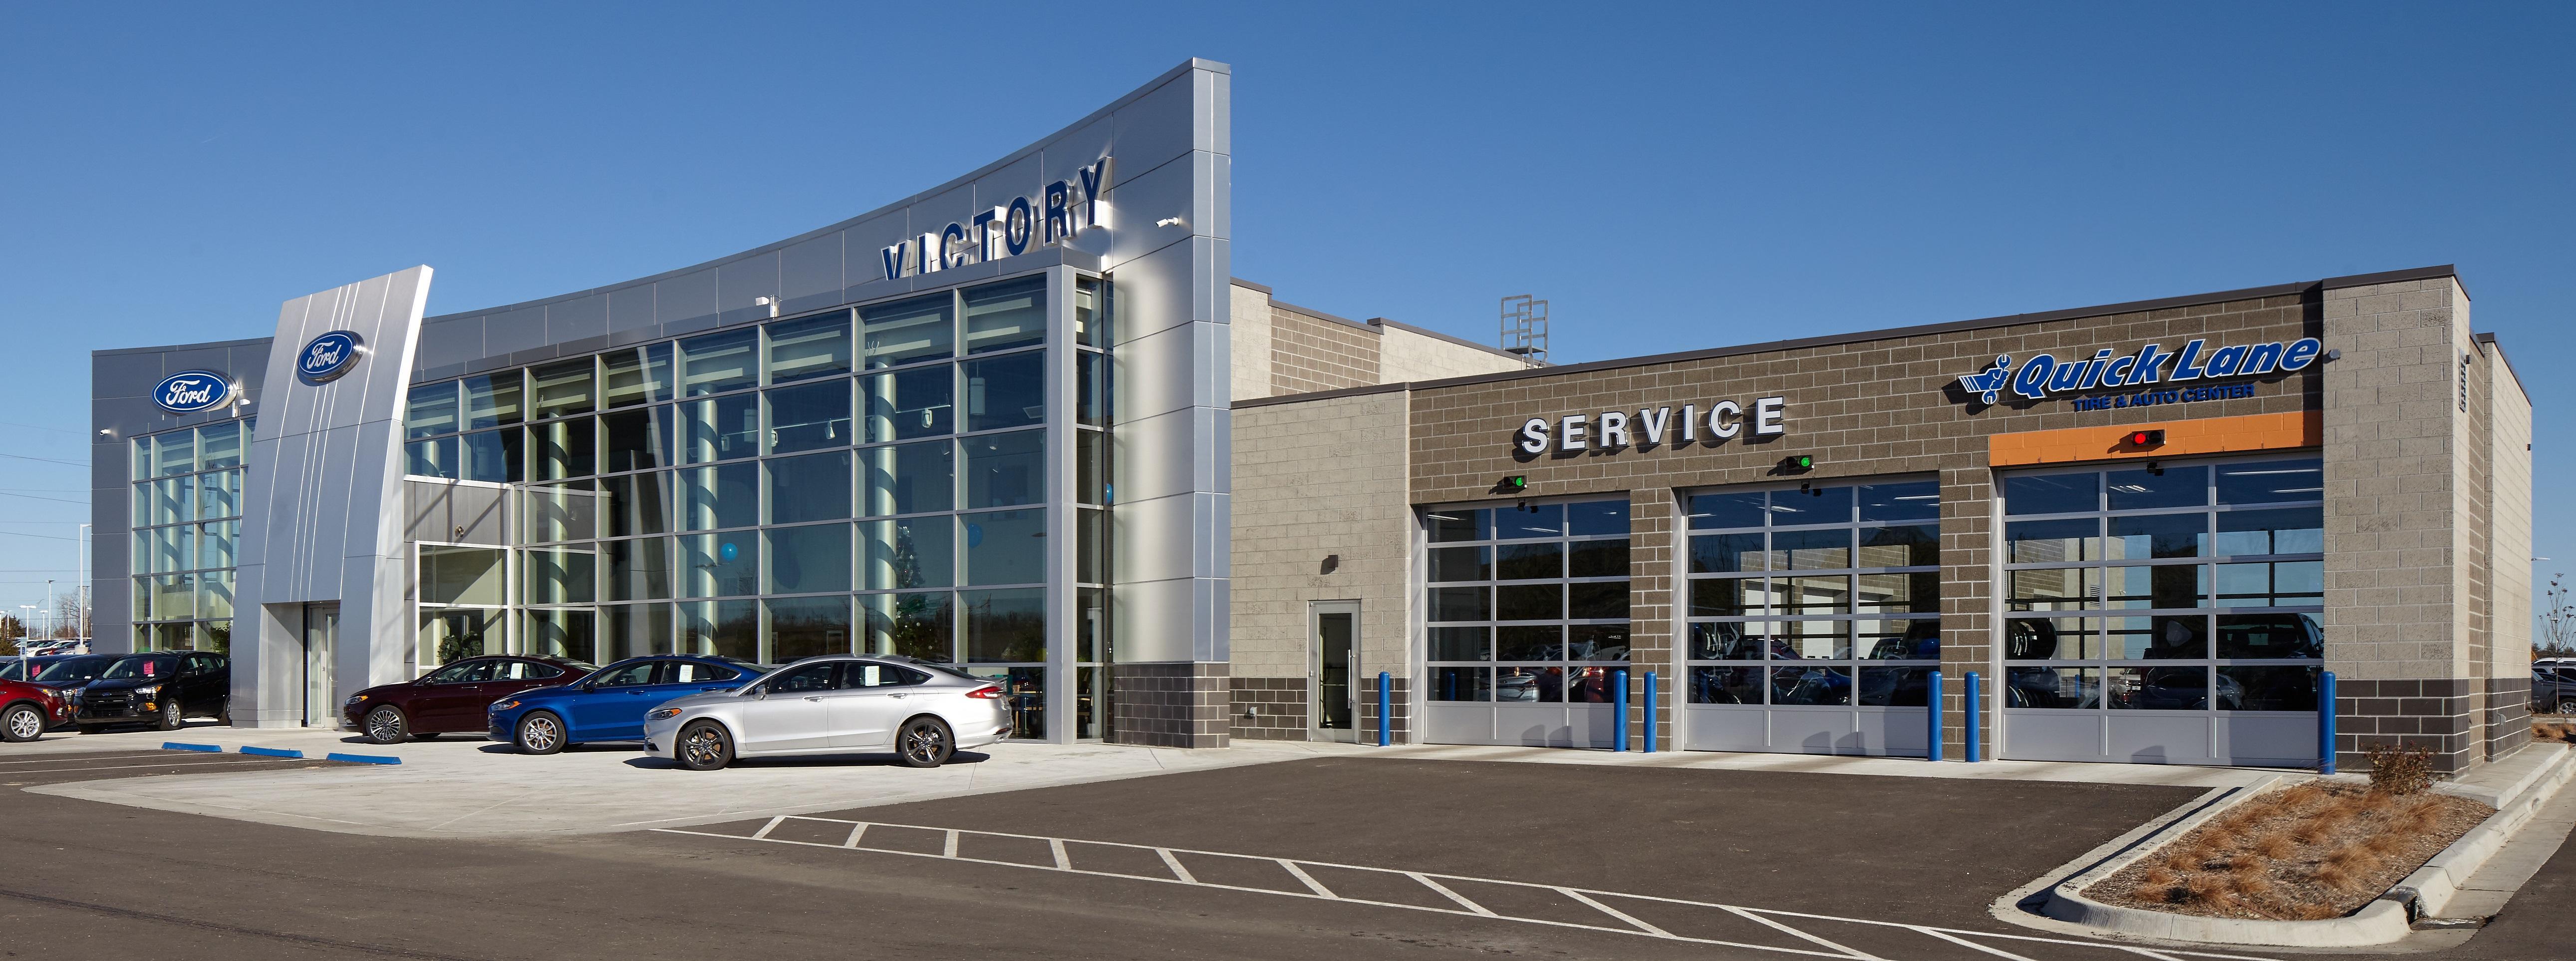 Victory Ford 1800 N 100th Terrace Kansas City KS Auto Dealers